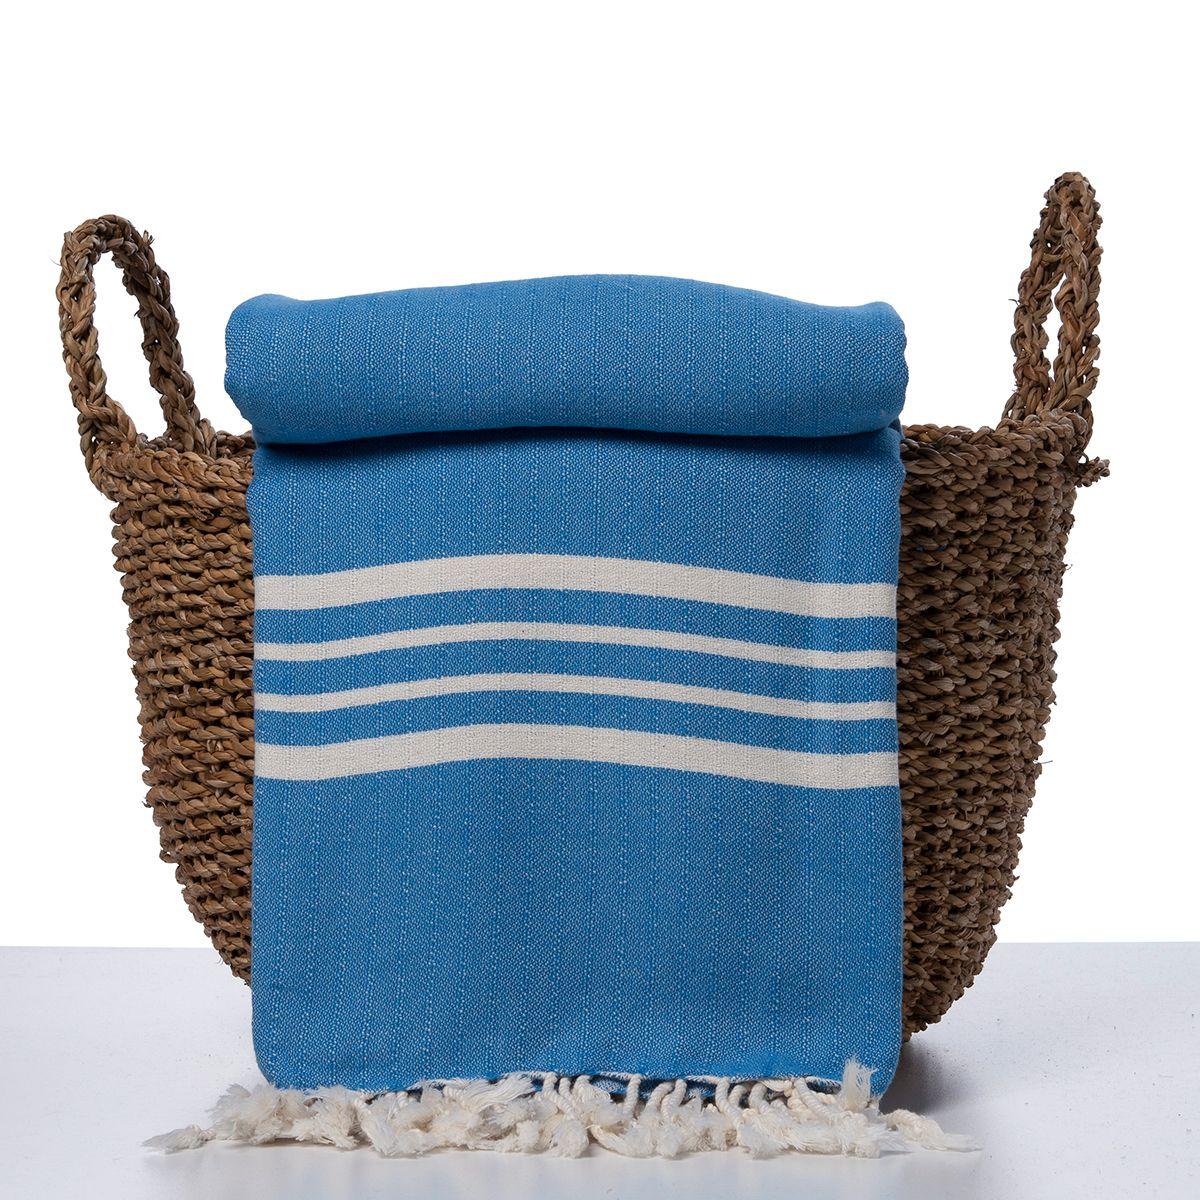 Peştemal Sultan / Duo - Koyu Mavi